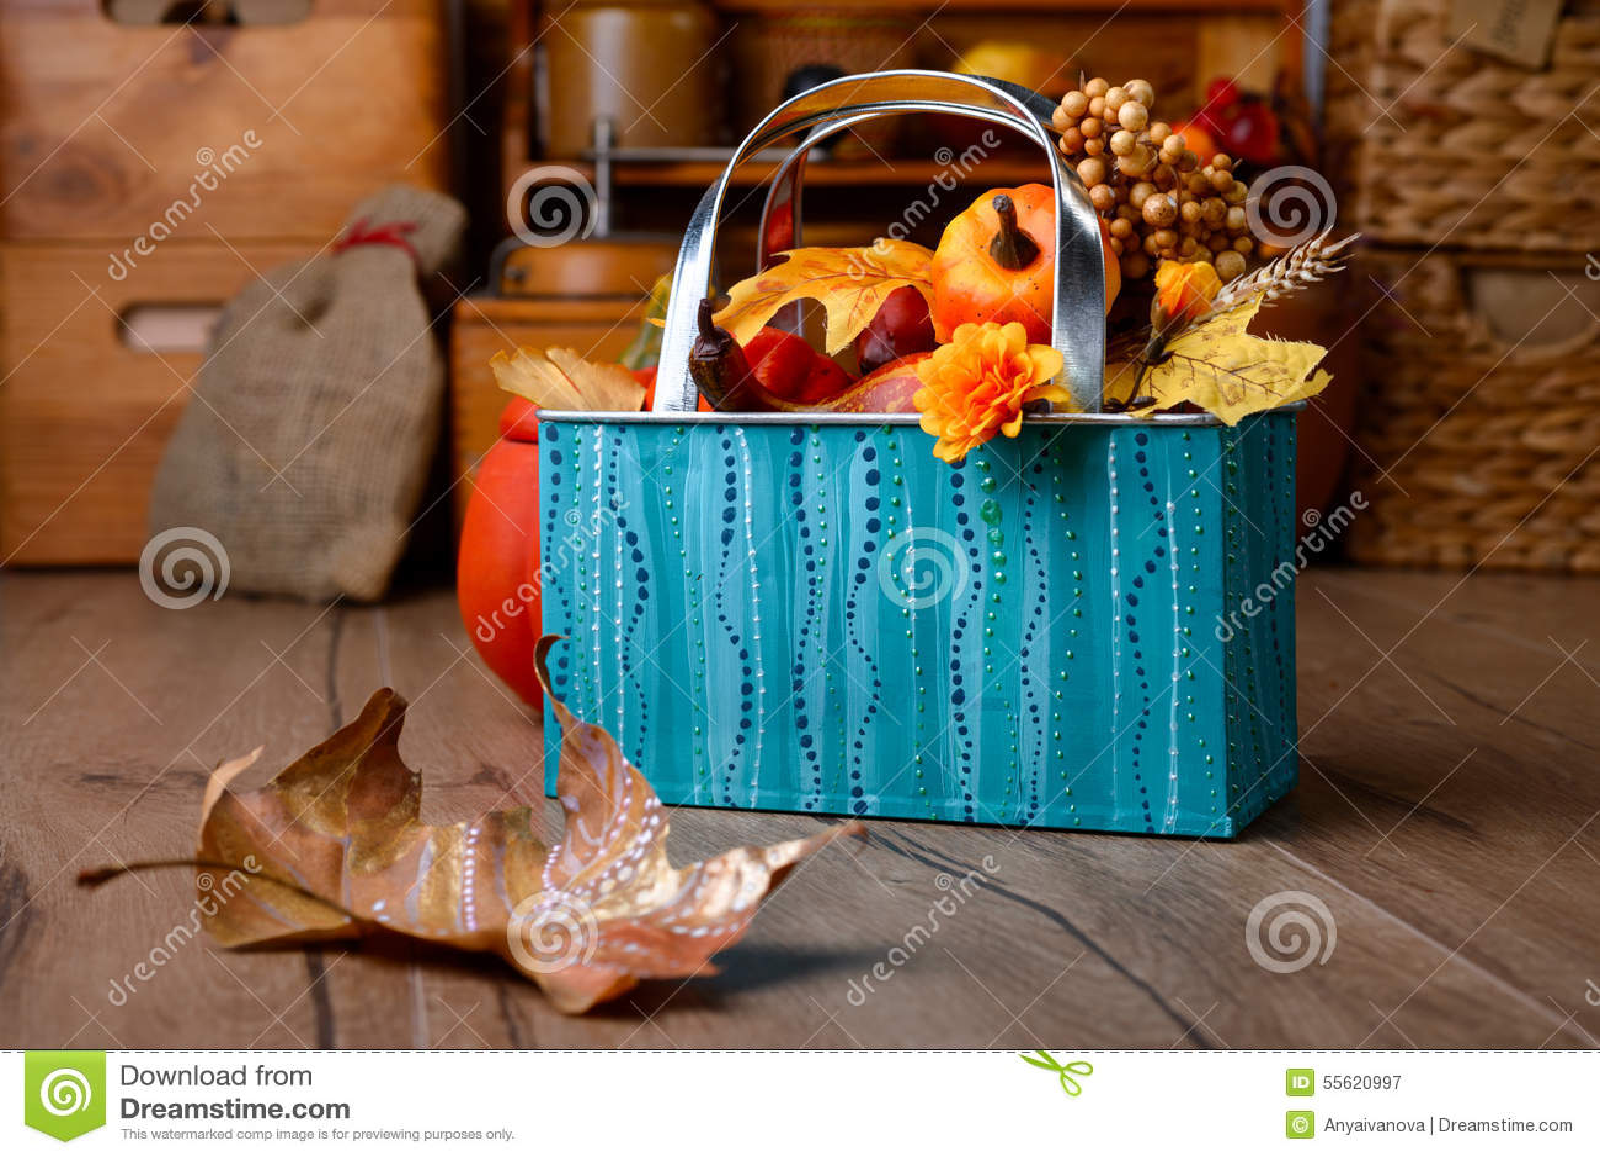 turquoise kitchen decor bakers racks for kitchens 在葡萄酒厨房的秋天装饰绿松石和orane的库存图片 图片包括有10月 橙色 在葡萄酒厨房的秋天装饰绿松石和orane的